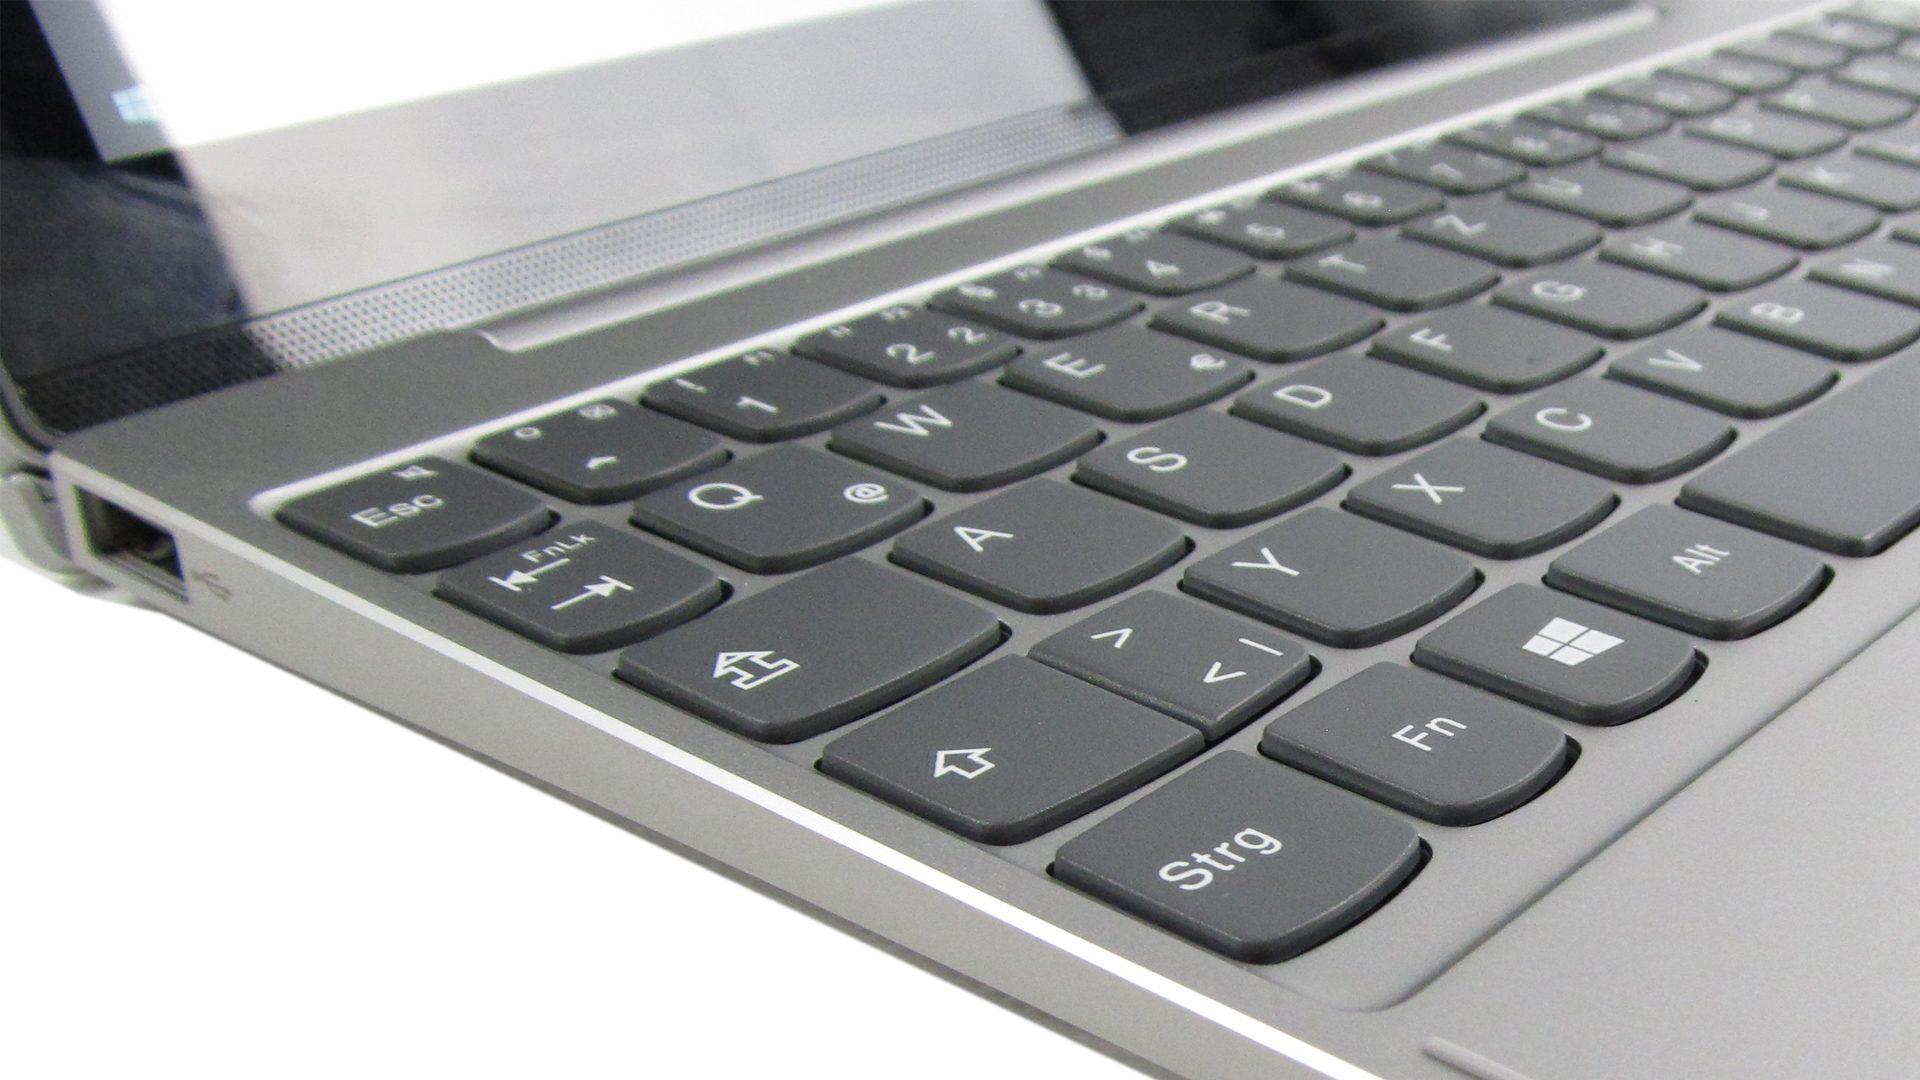 lenovo miix 320 10icr 2 in 1 tablet mit 10 1 display. Black Bedroom Furniture Sets. Home Design Ideas